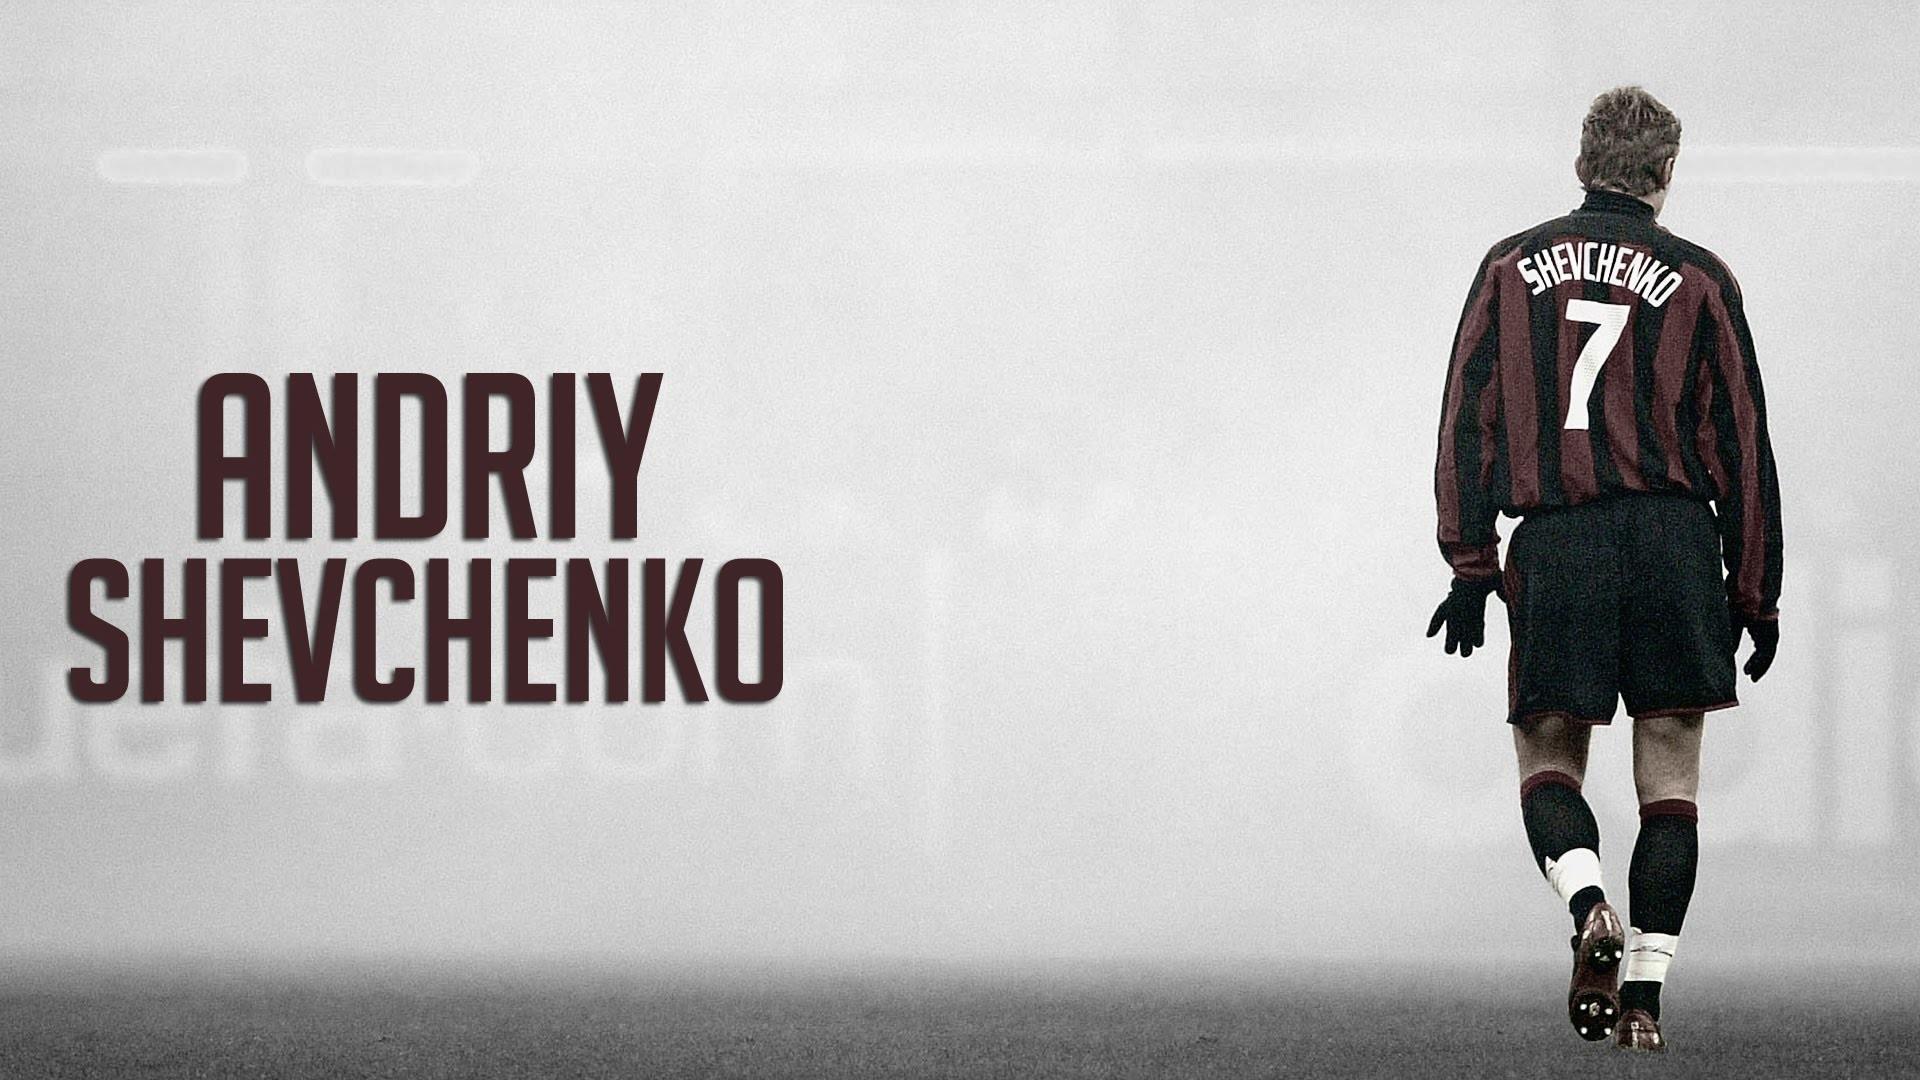 Andriy Shevchenko ○ Legendary Striker ○ A.C. Milan 1999-2006 – YouTube